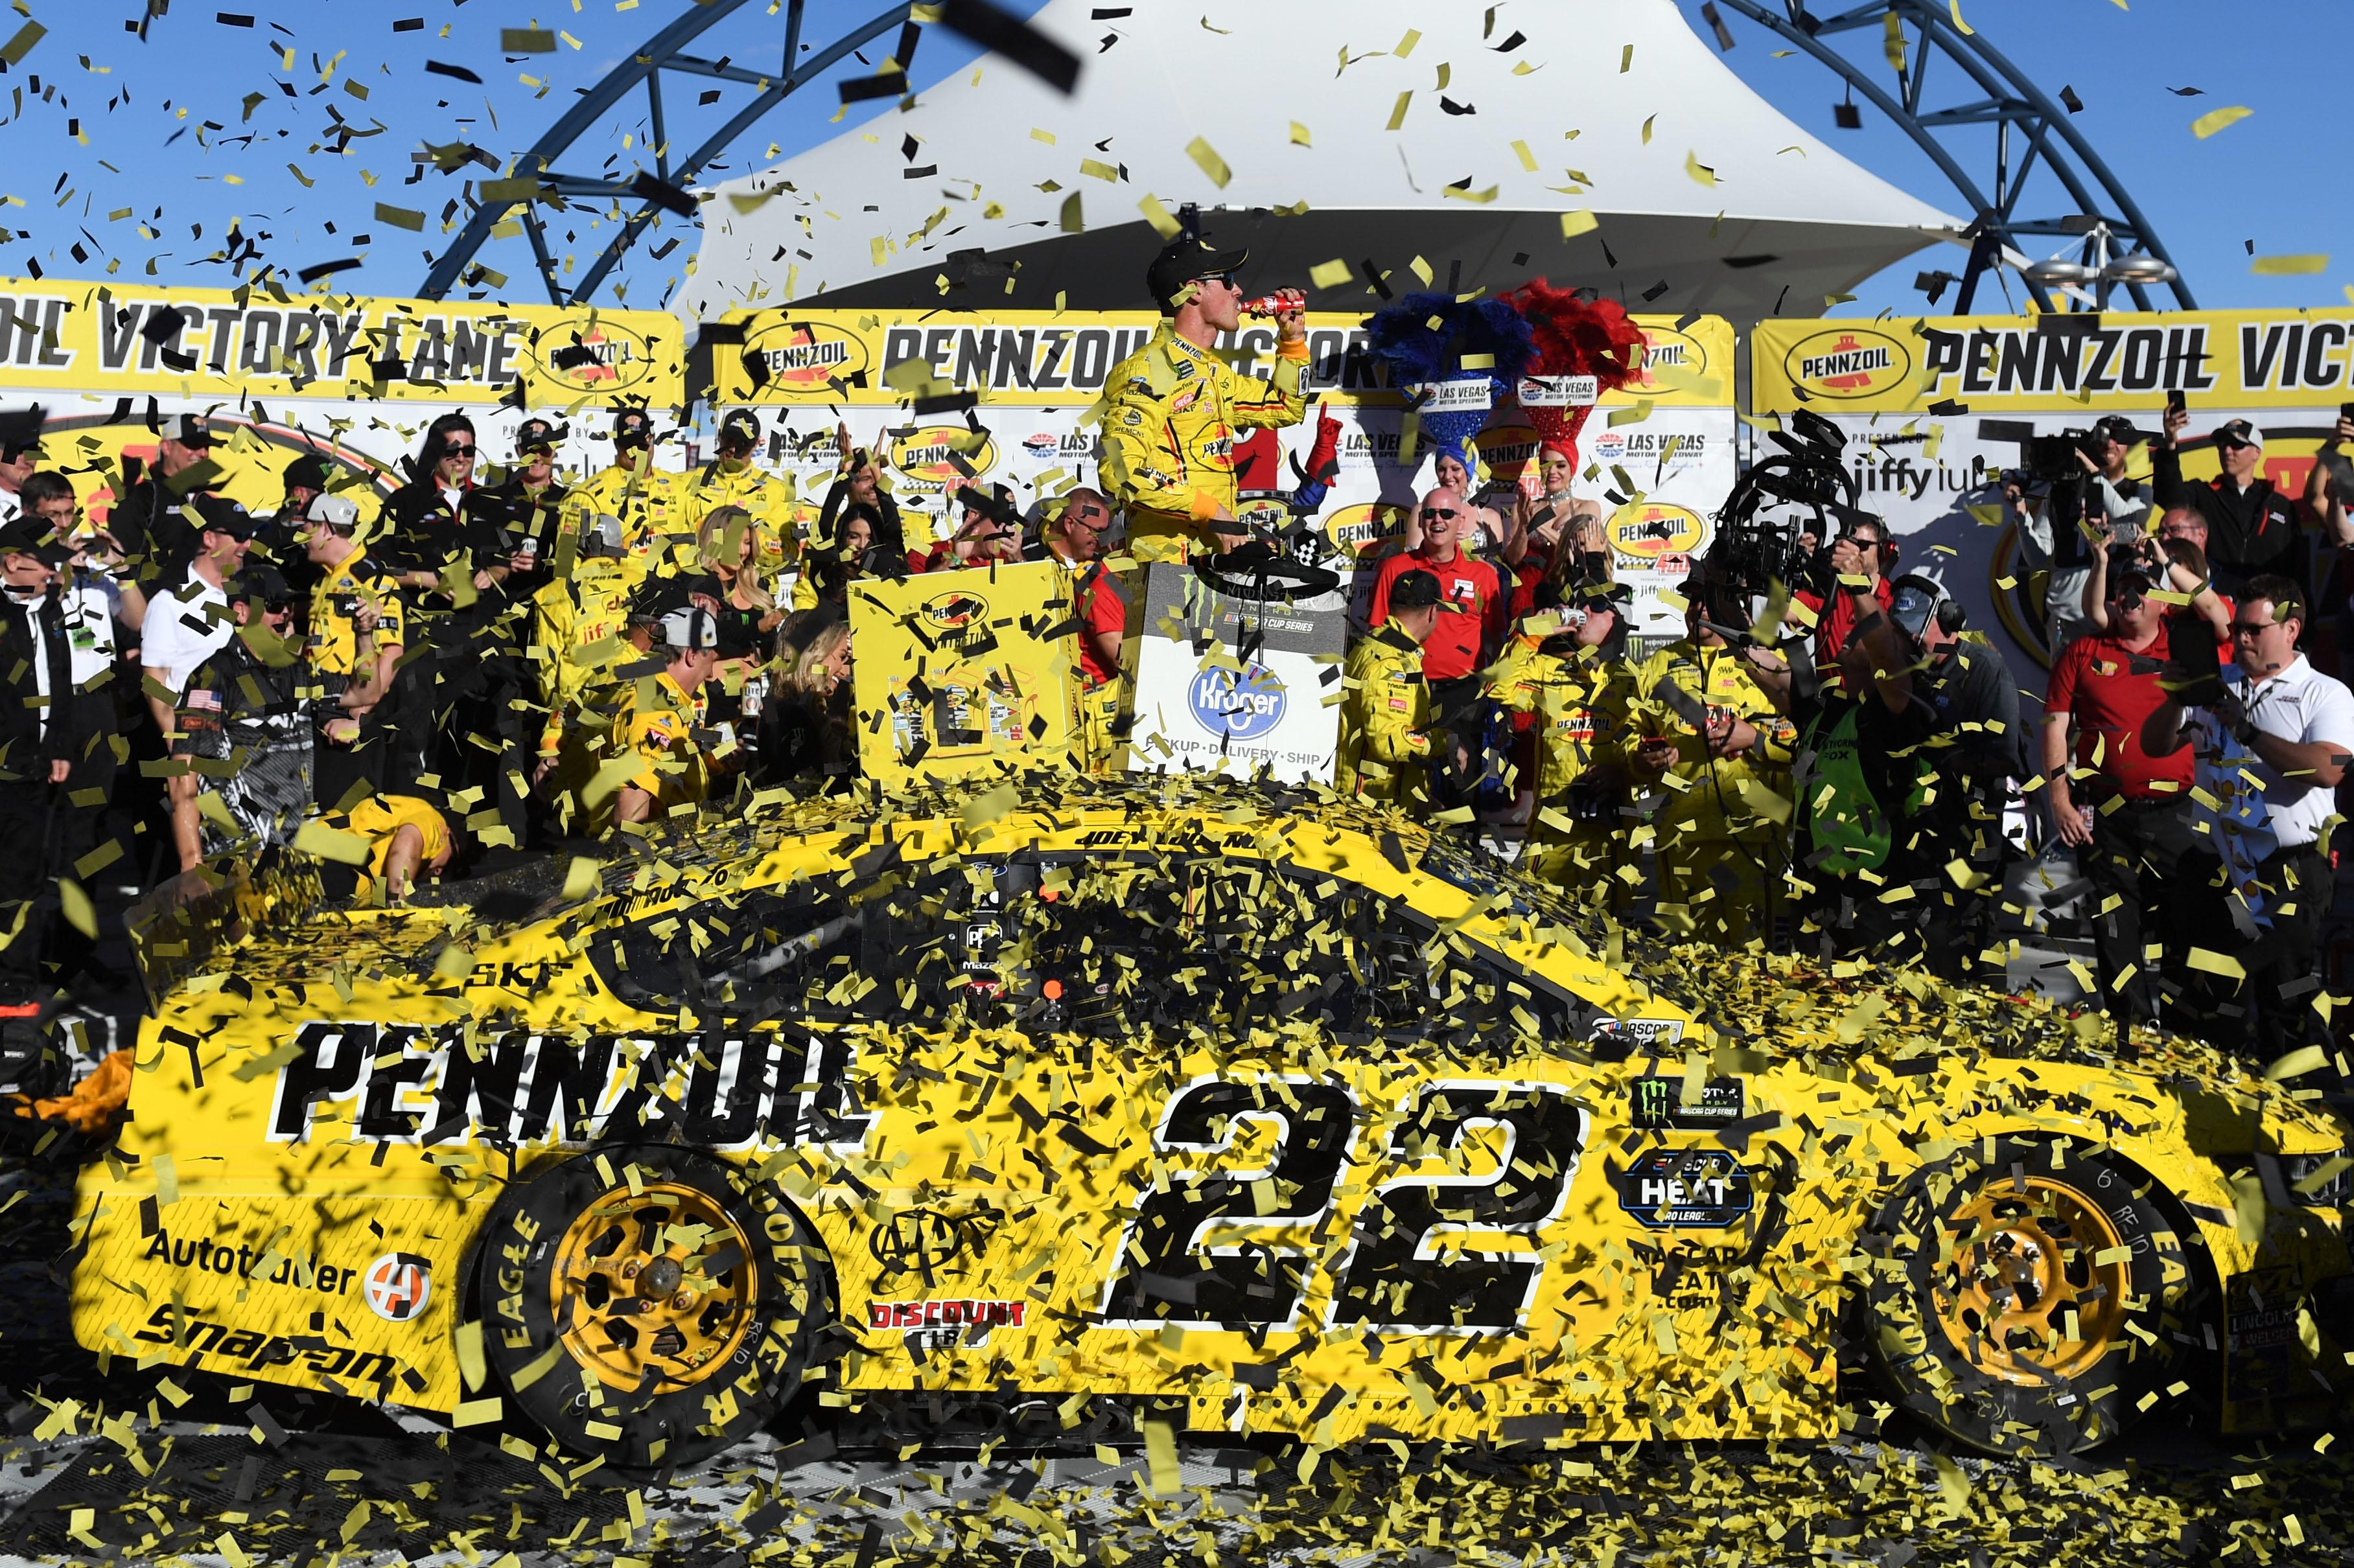 Joey Logano Talks About Winning Pennzoil 400